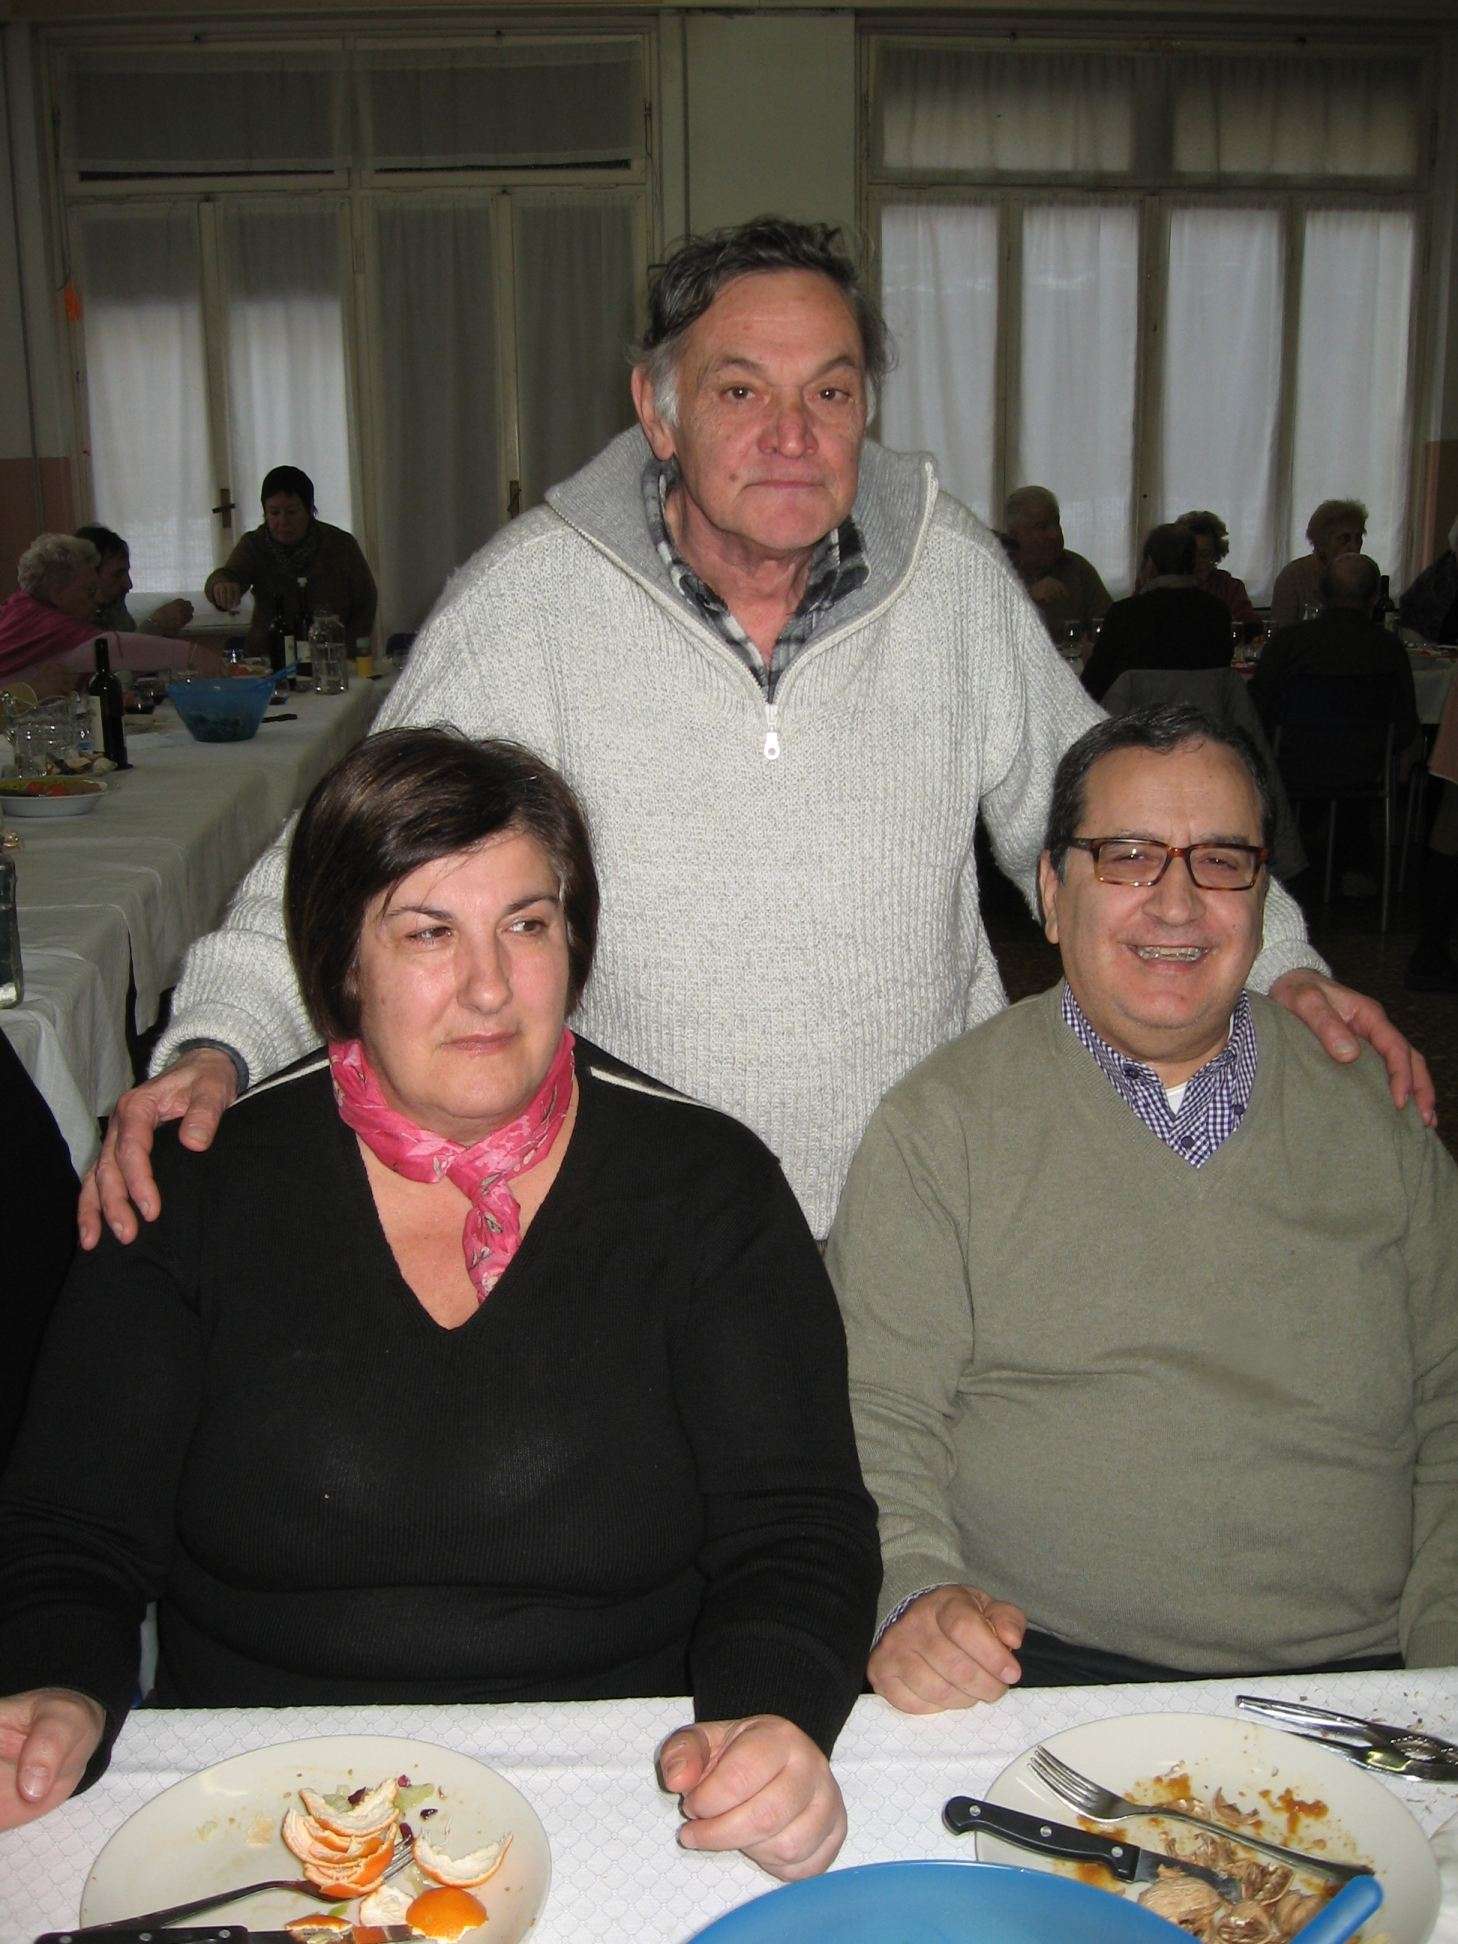 Pranzo_Comunitario-2009-12-19--14.09.28